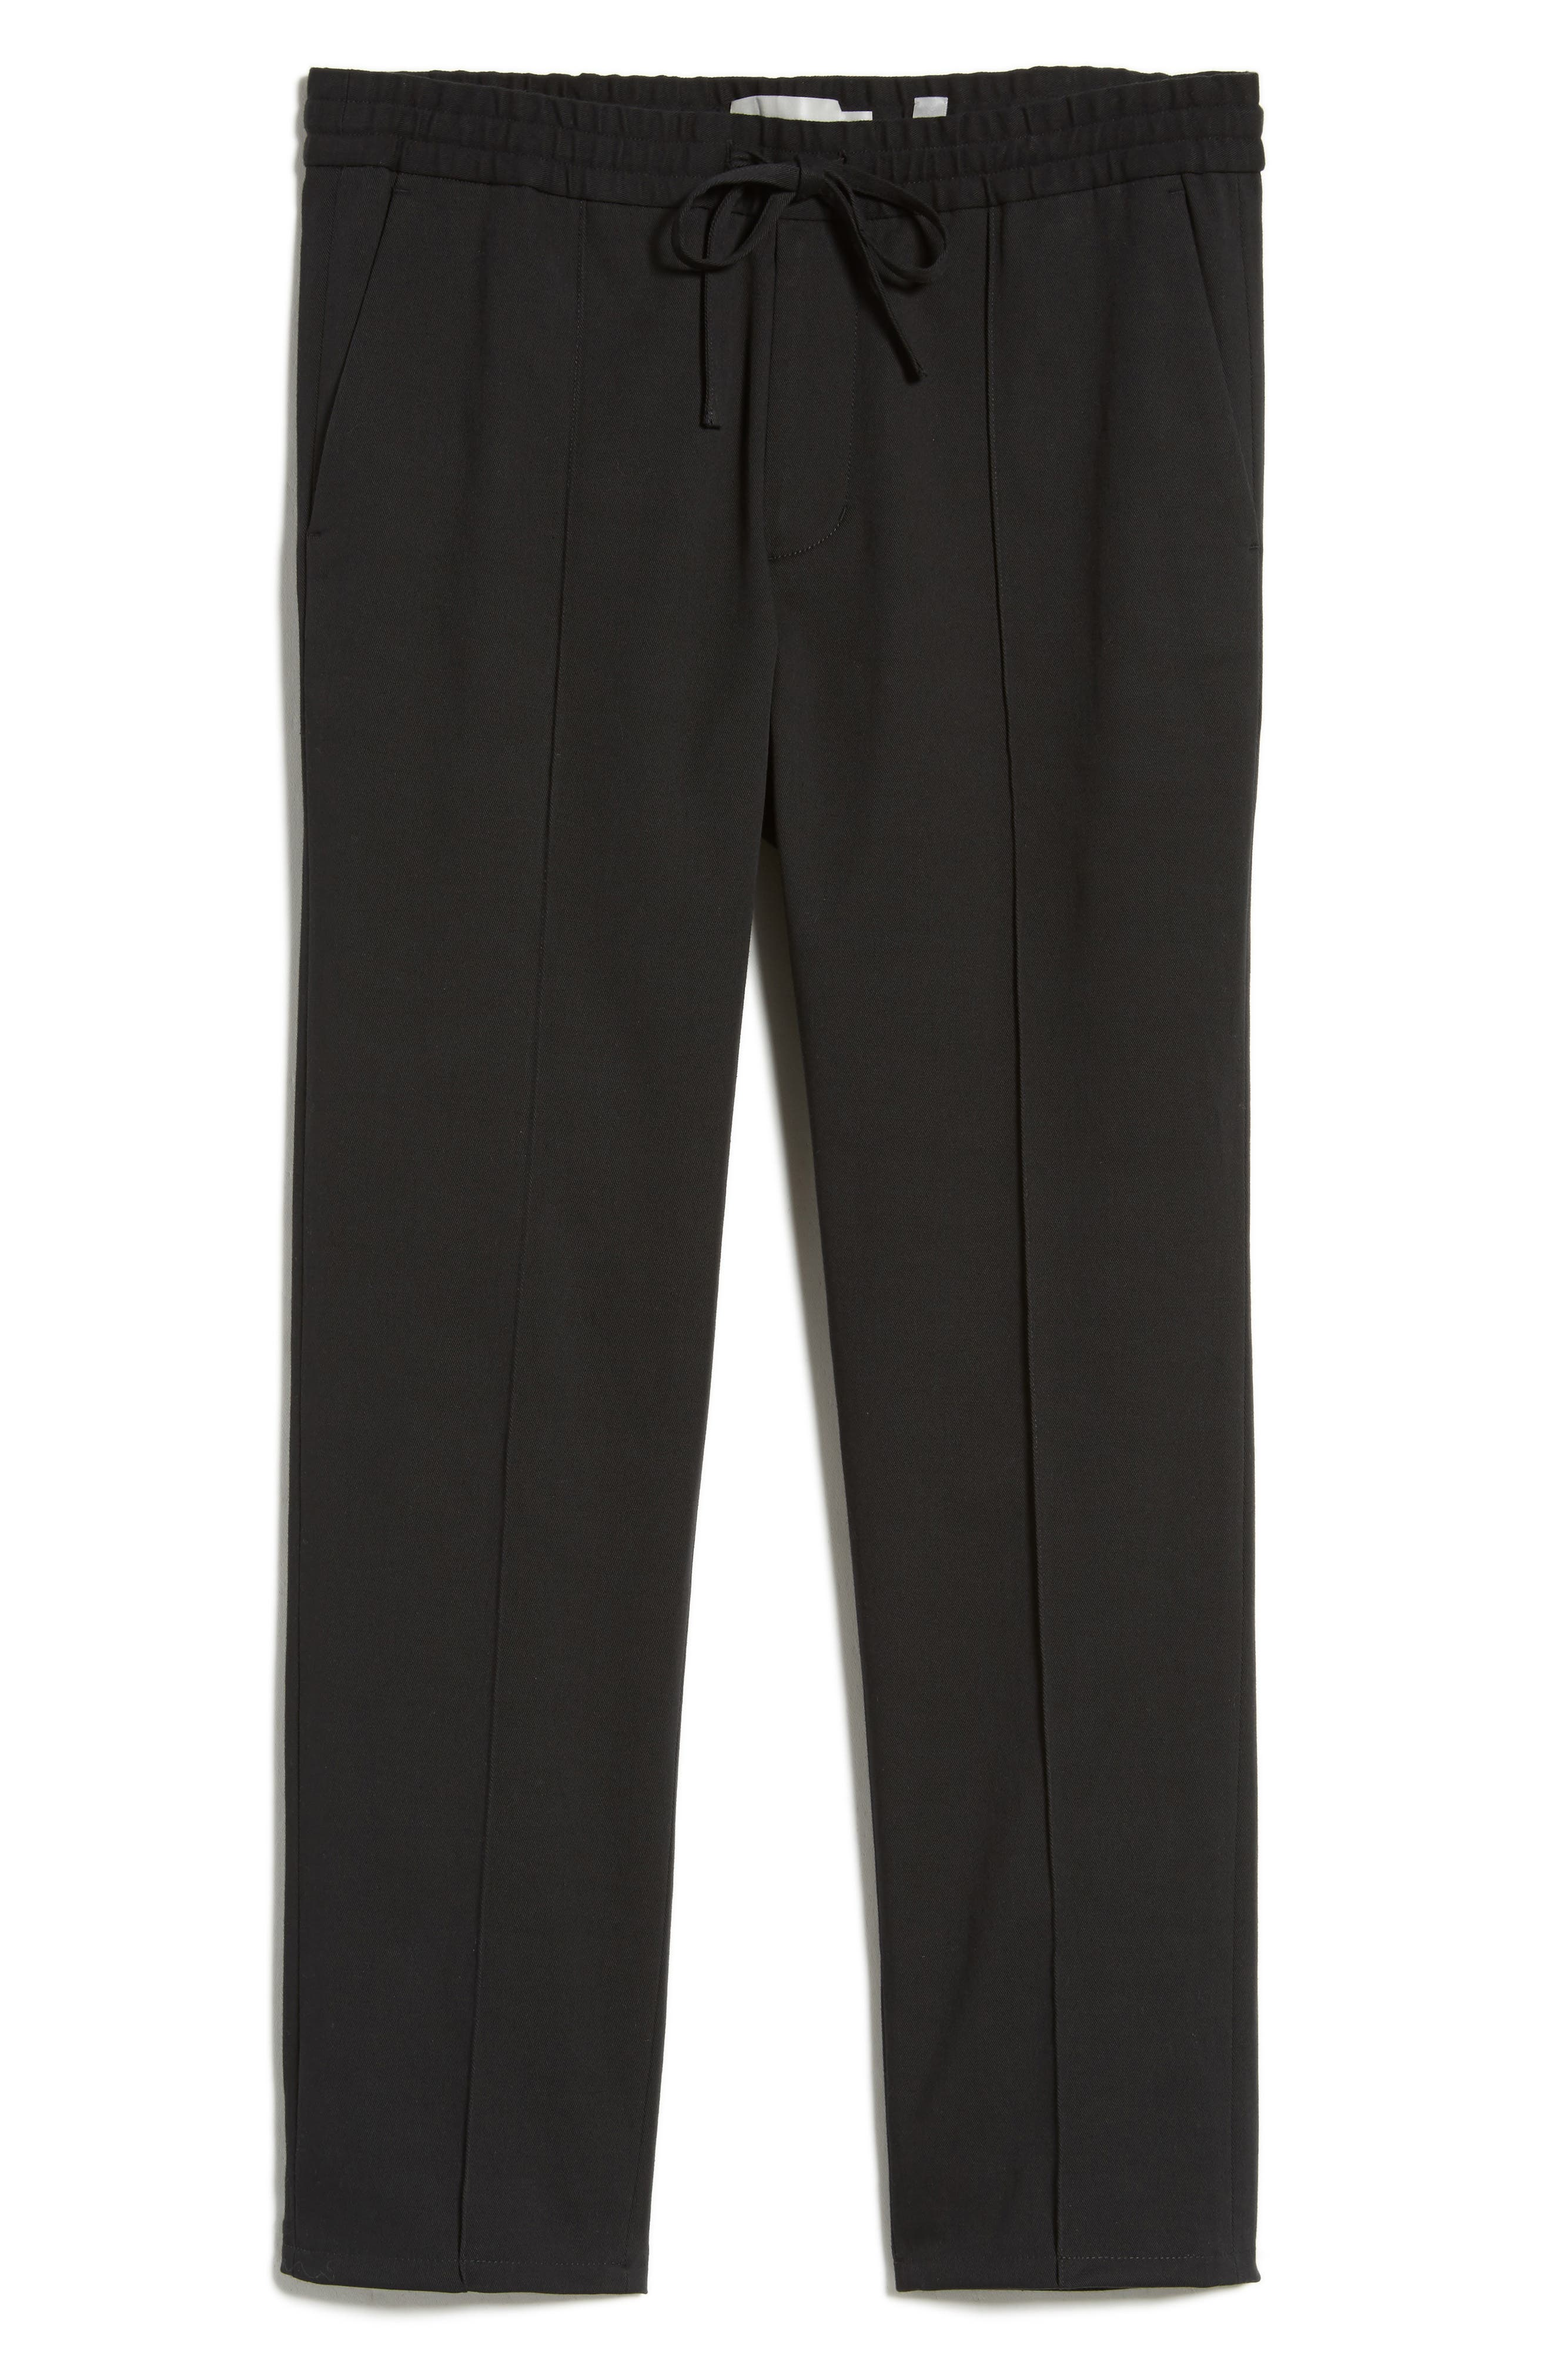 Regular Fit Track Pants,                             Alternate thumbnail 6, color,                             Black